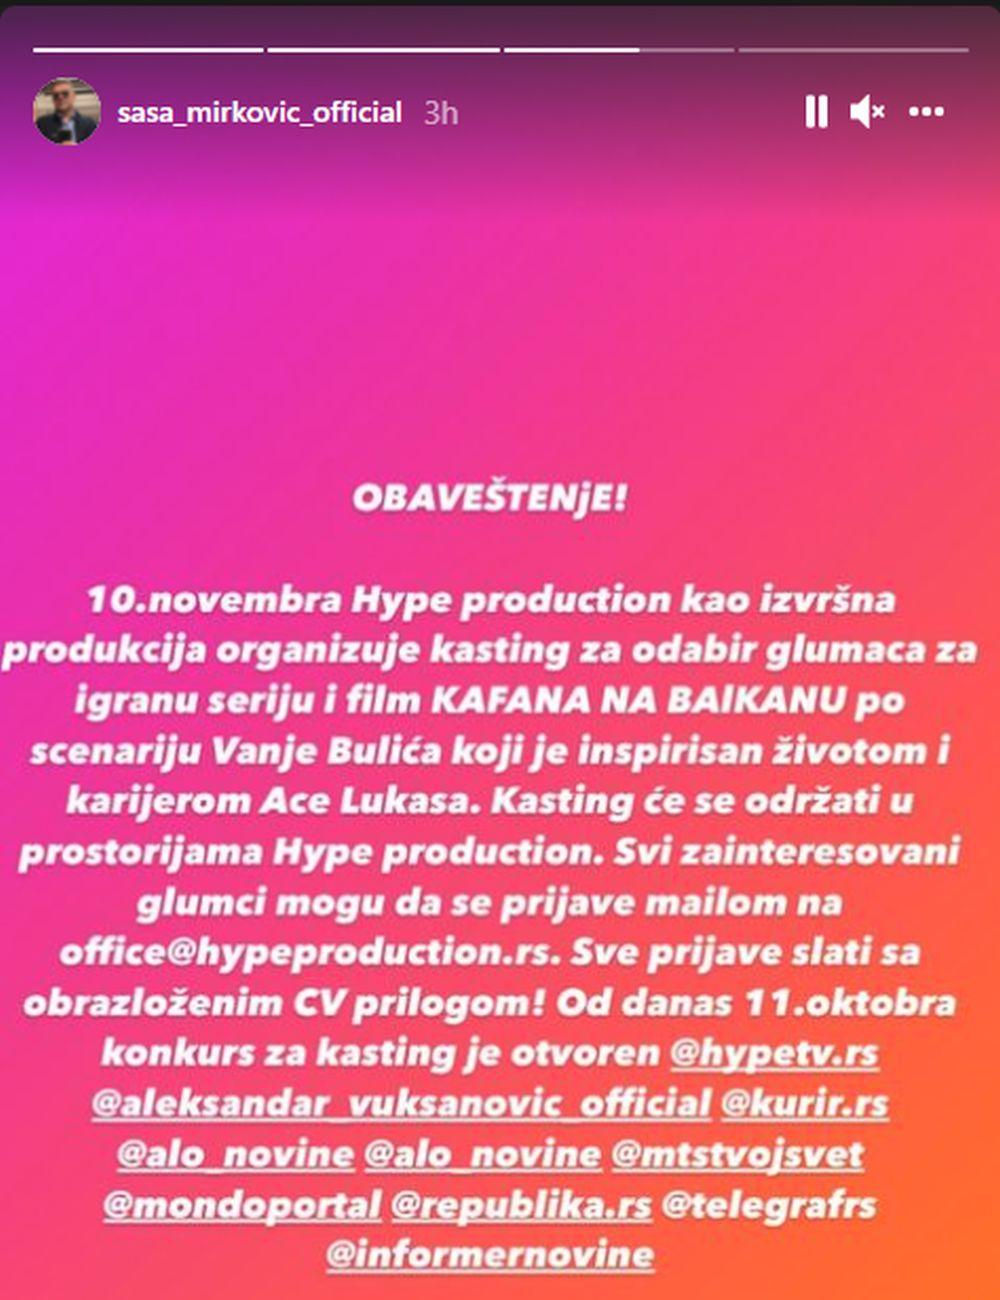 sasa mirkovic instagram kasting